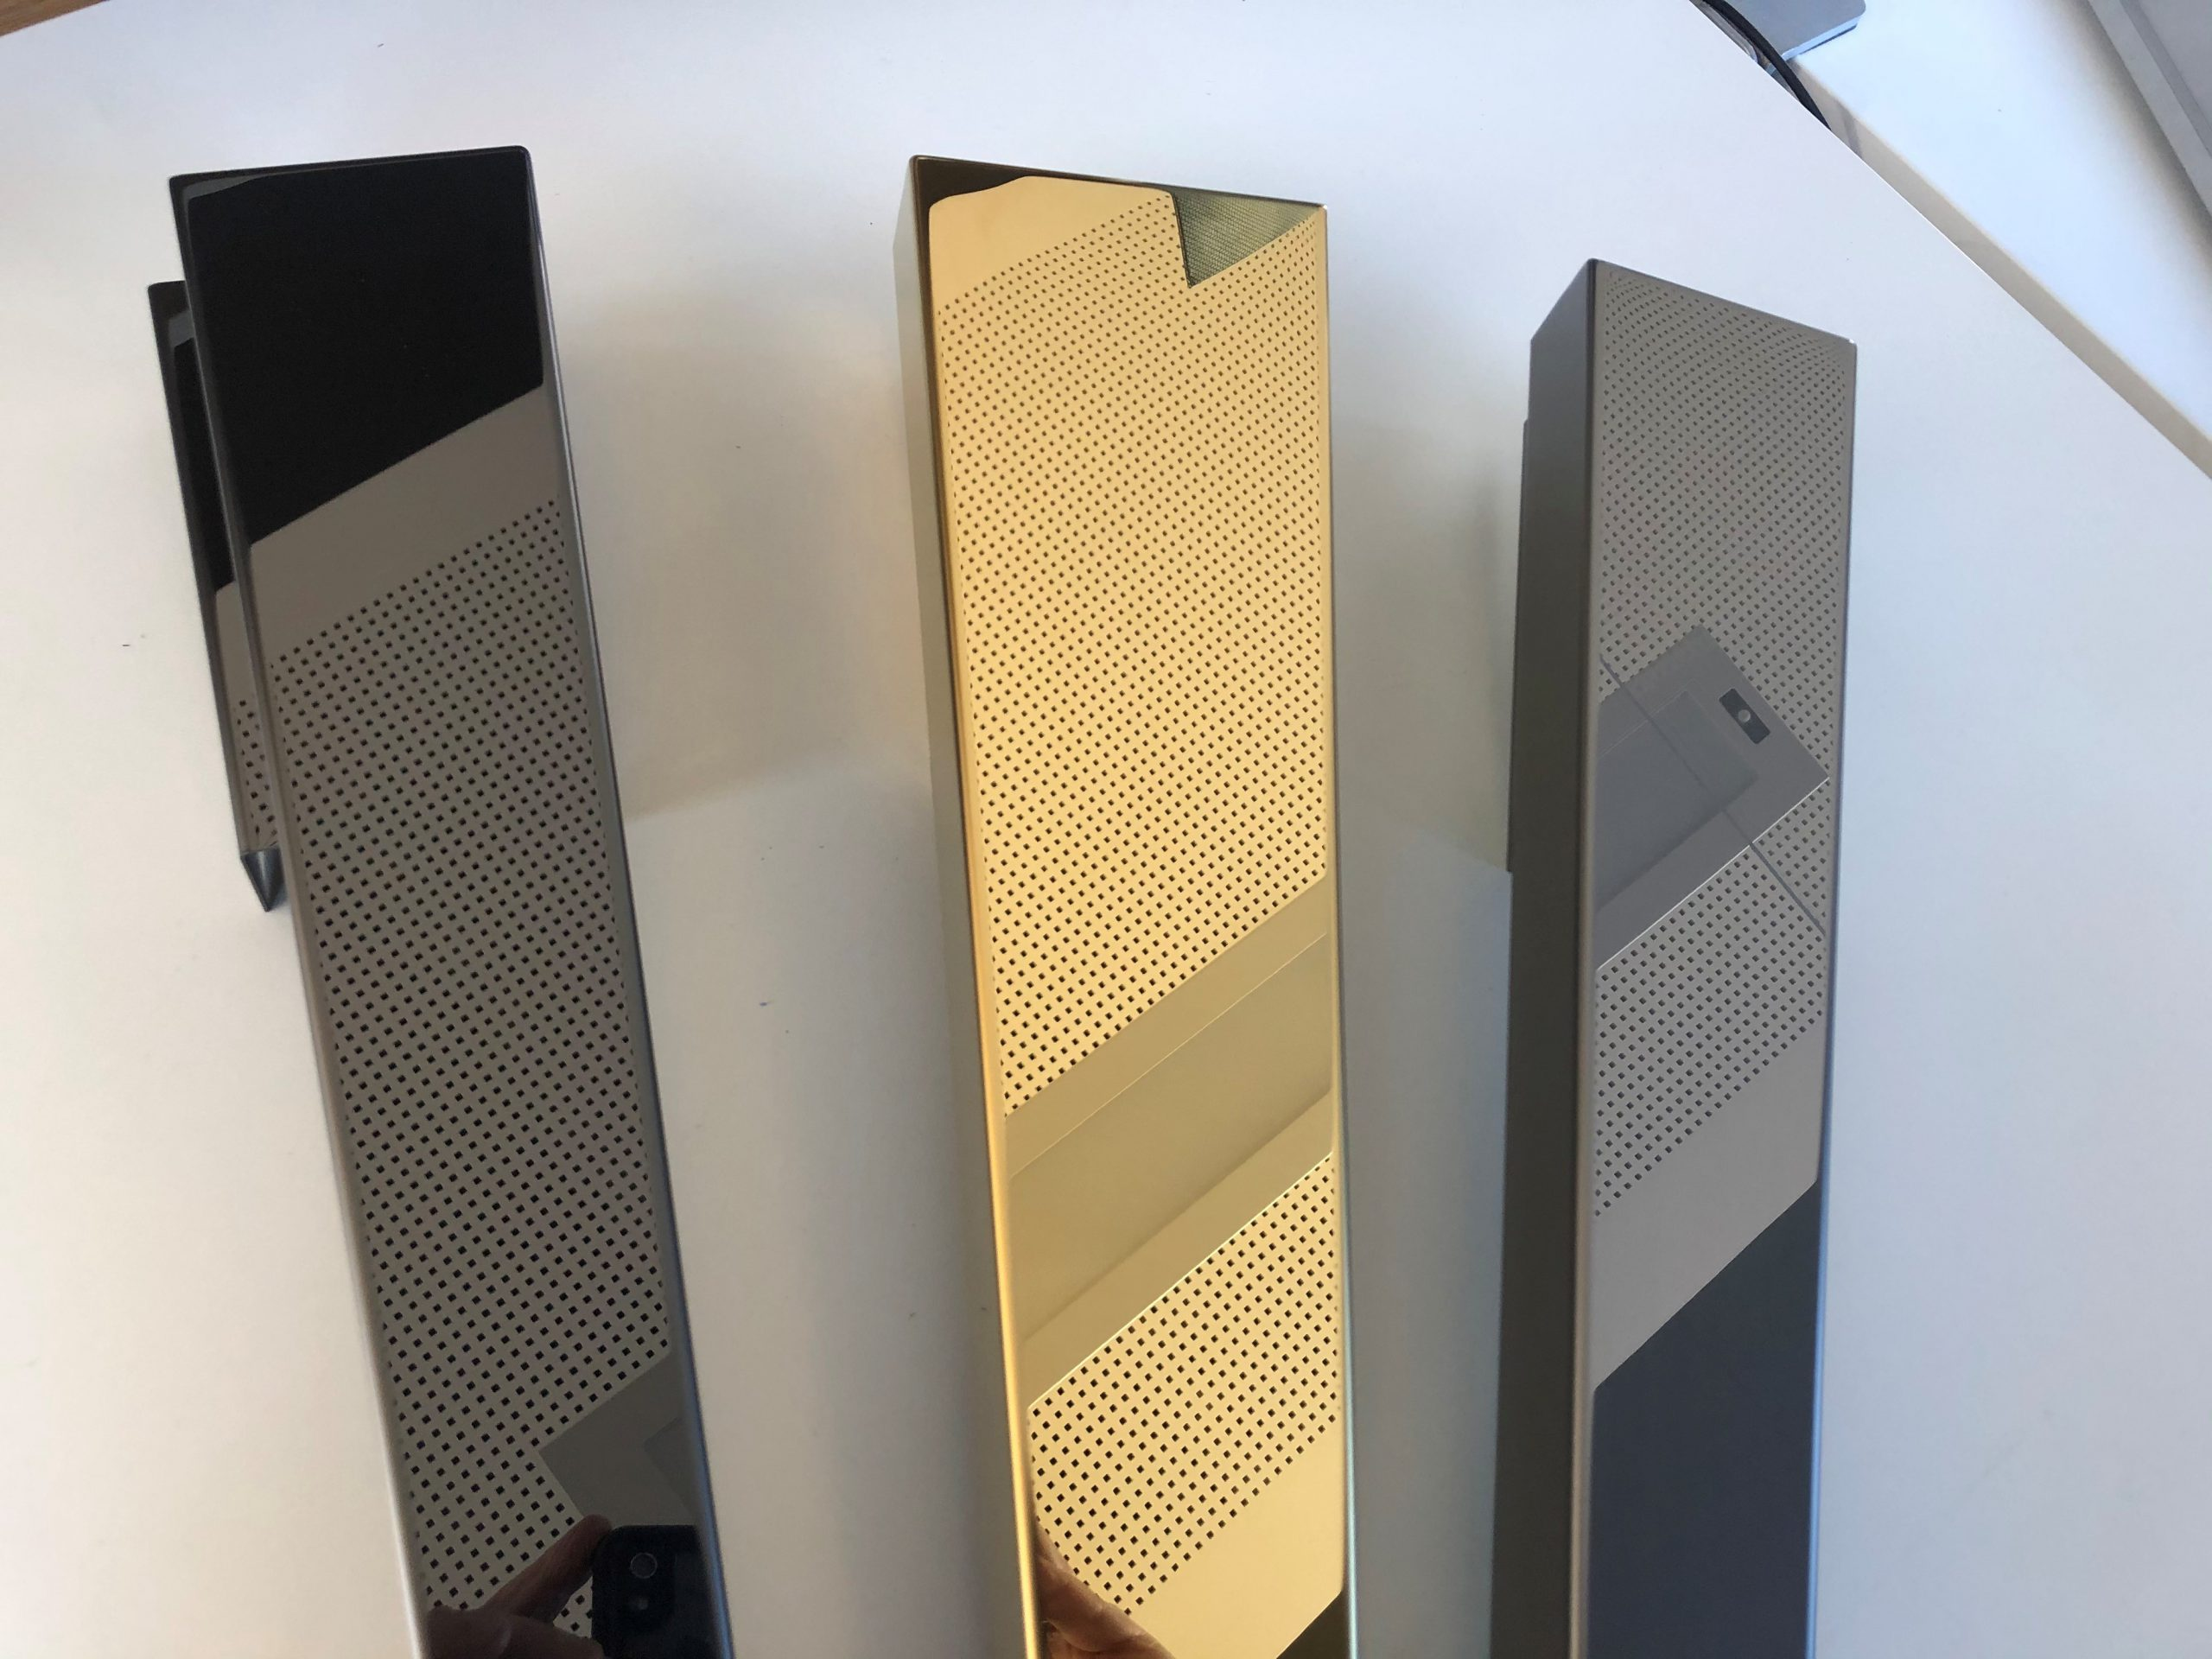 Stainless steel black-gold mirror PVD Tin